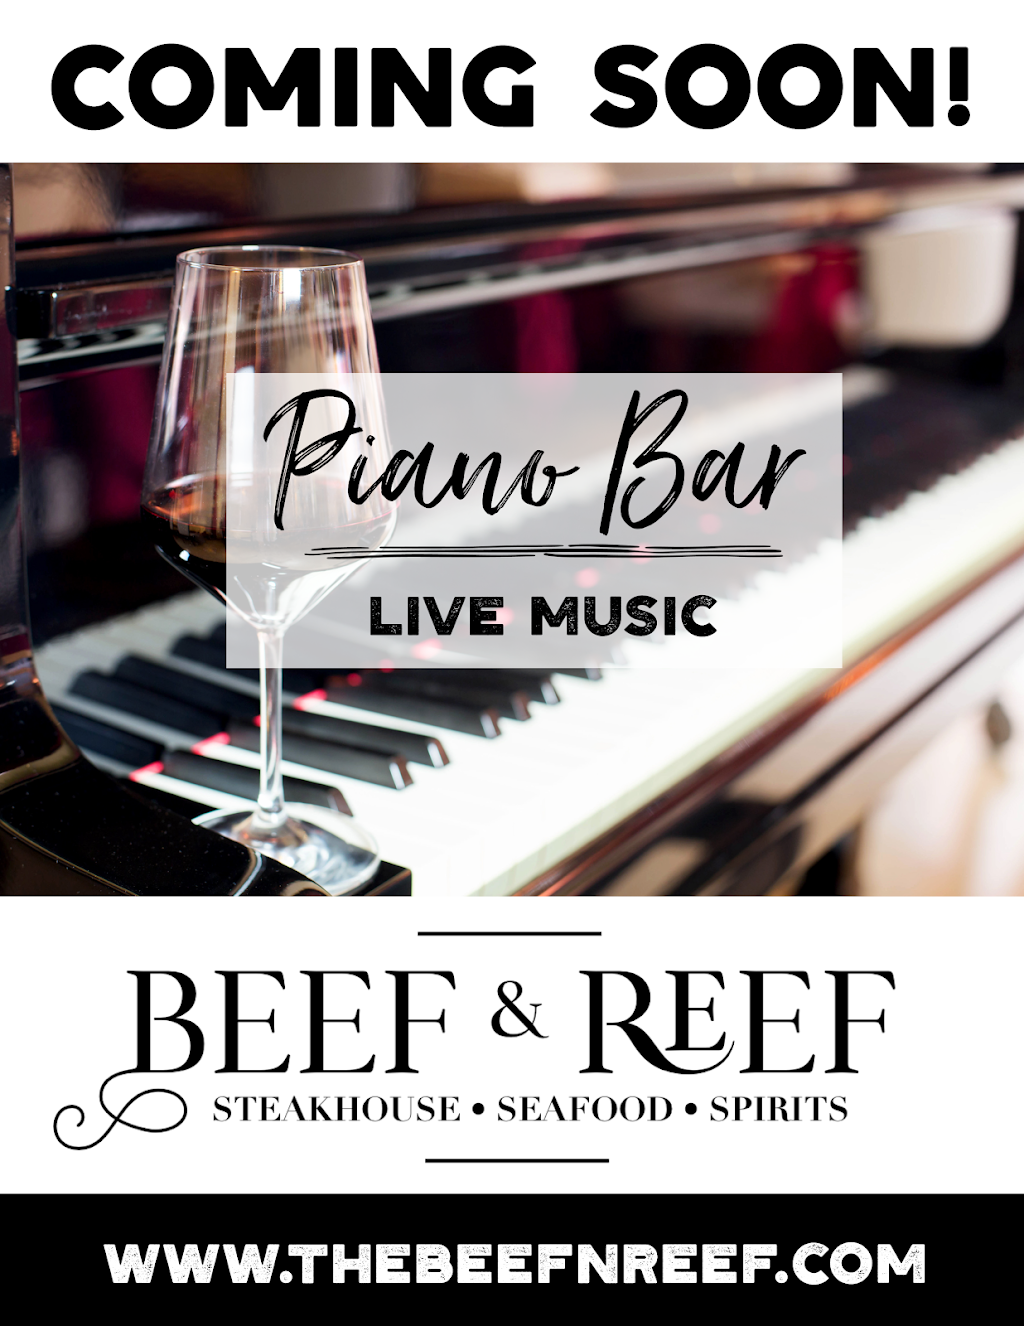 Beef & Reef | restaurant | 4331 N Ocean Dr, Lauderdale-By-The-Sea, FL 33308, USA | 9543510310 OR +1 954-351-0310